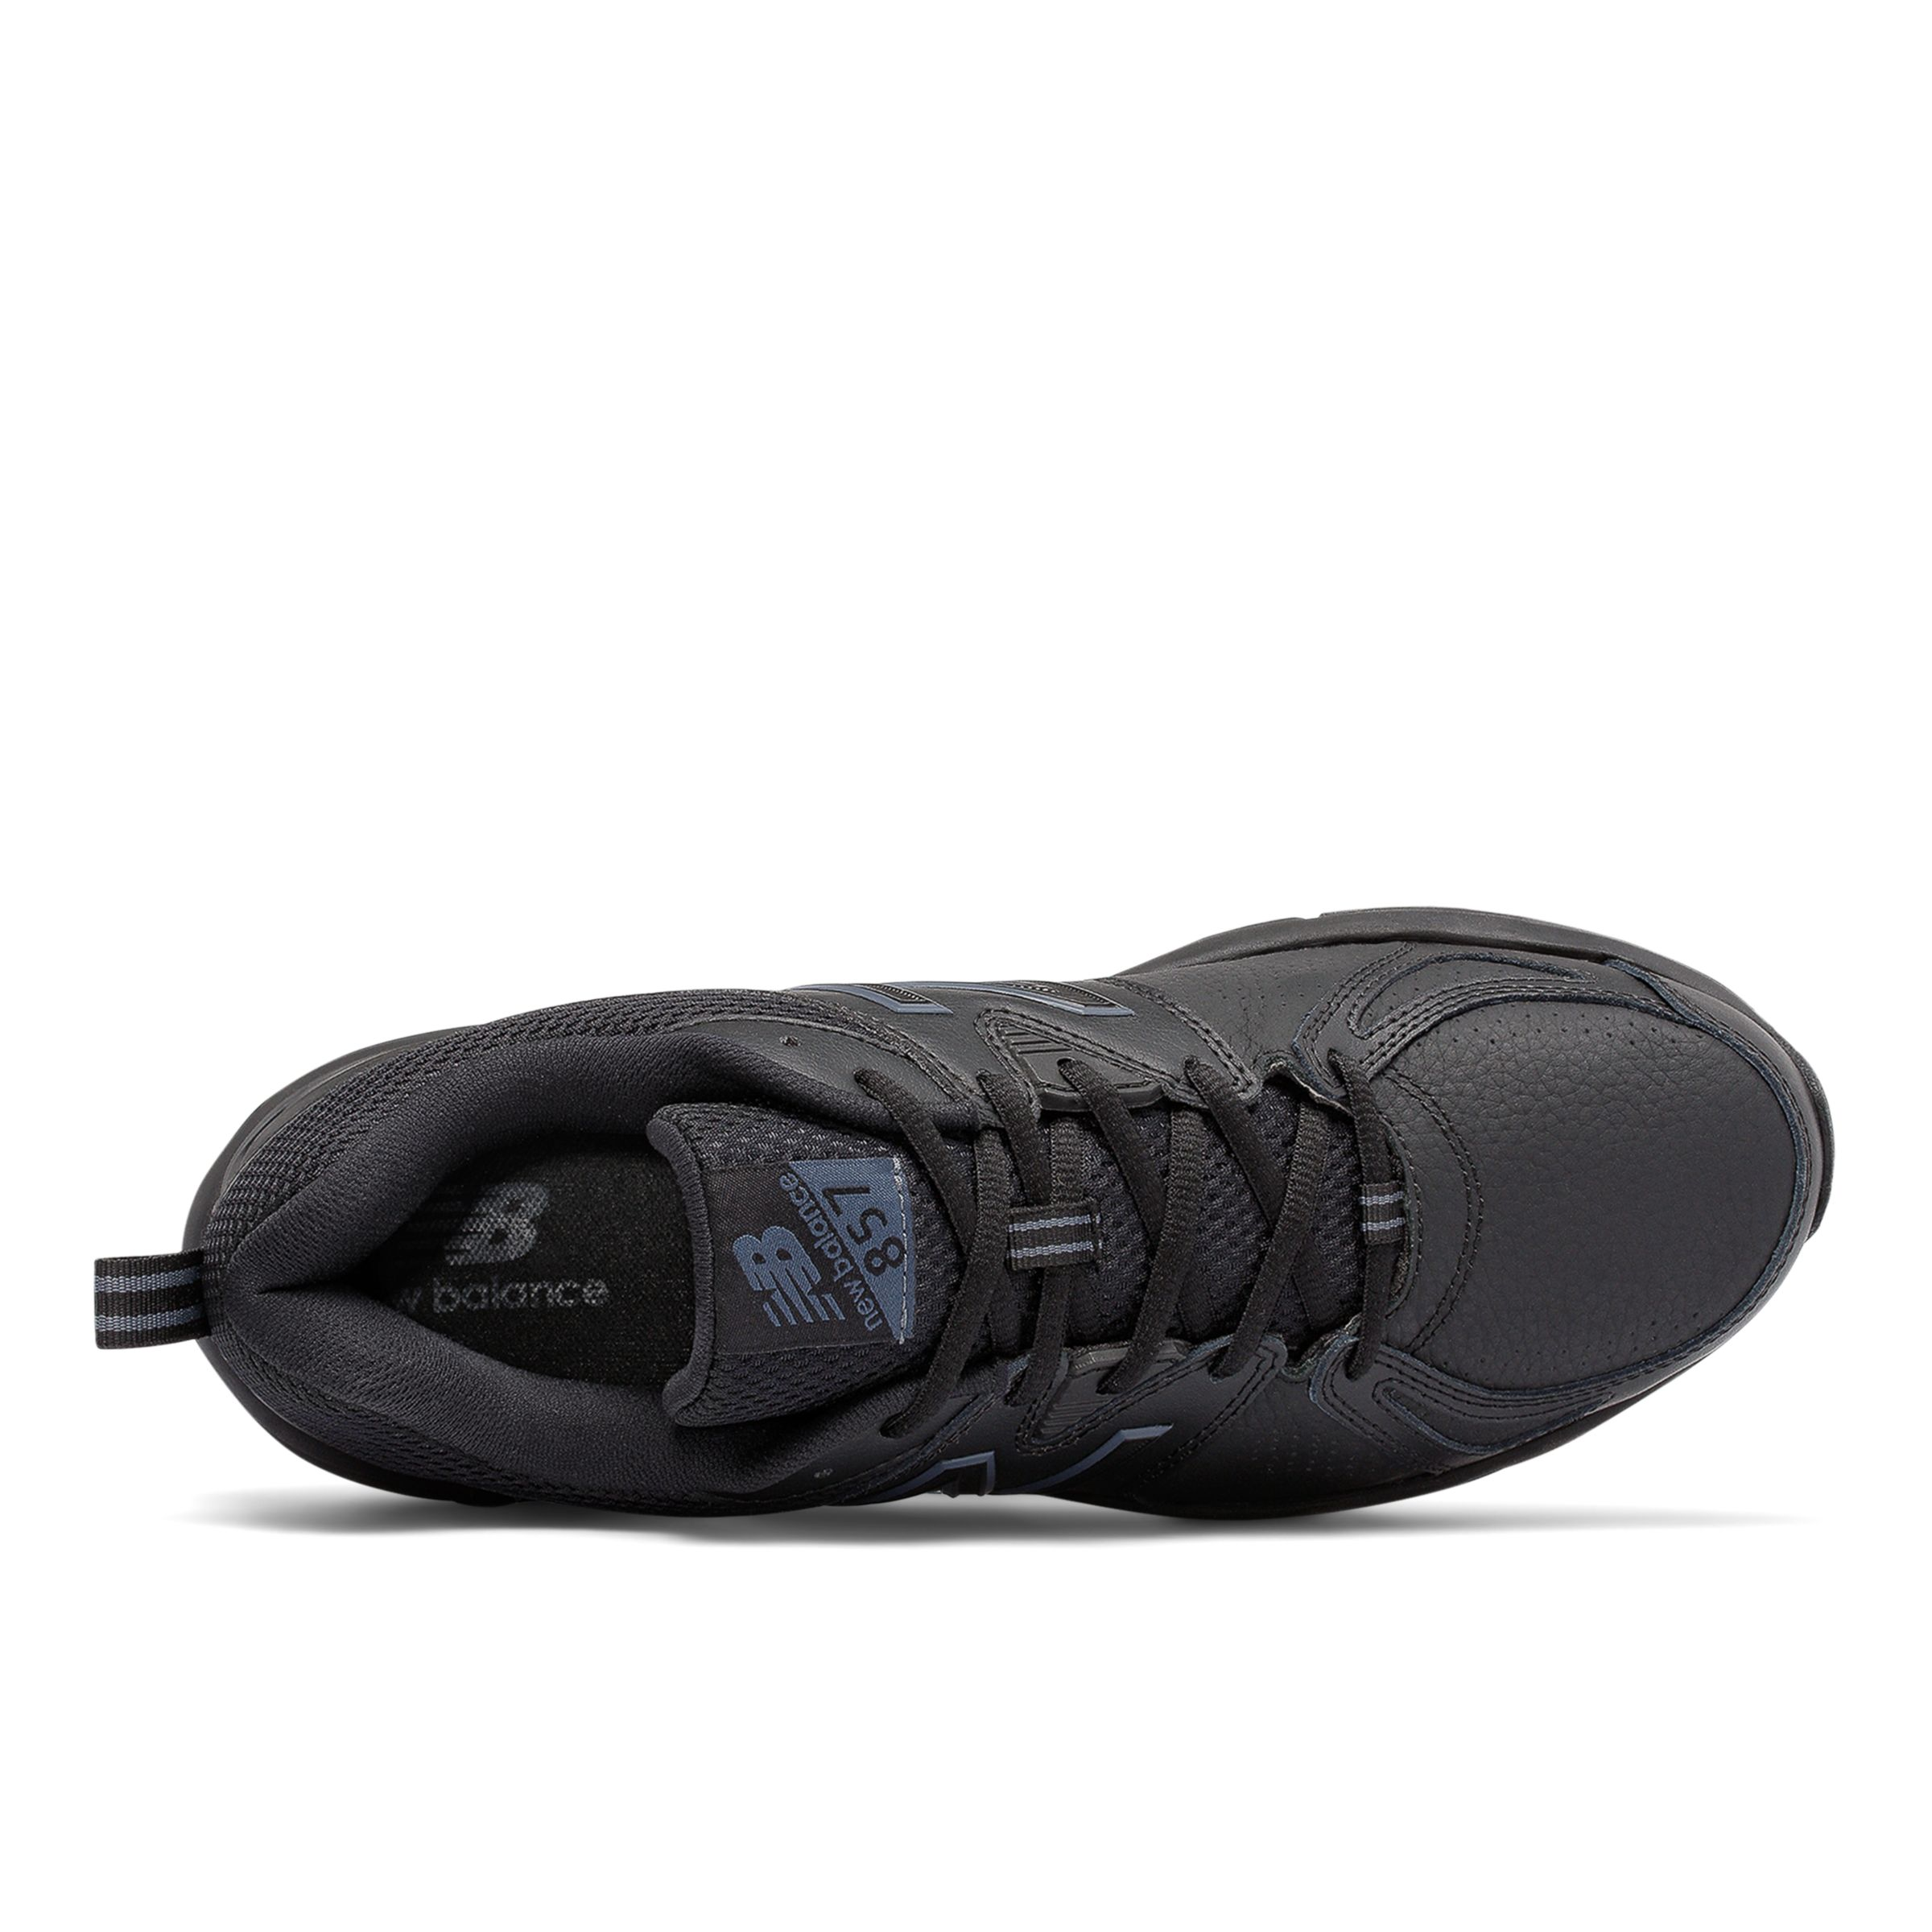 thumbnail 7 - New-Balance-857v2-Men-039-s-Running-Training-Shoes